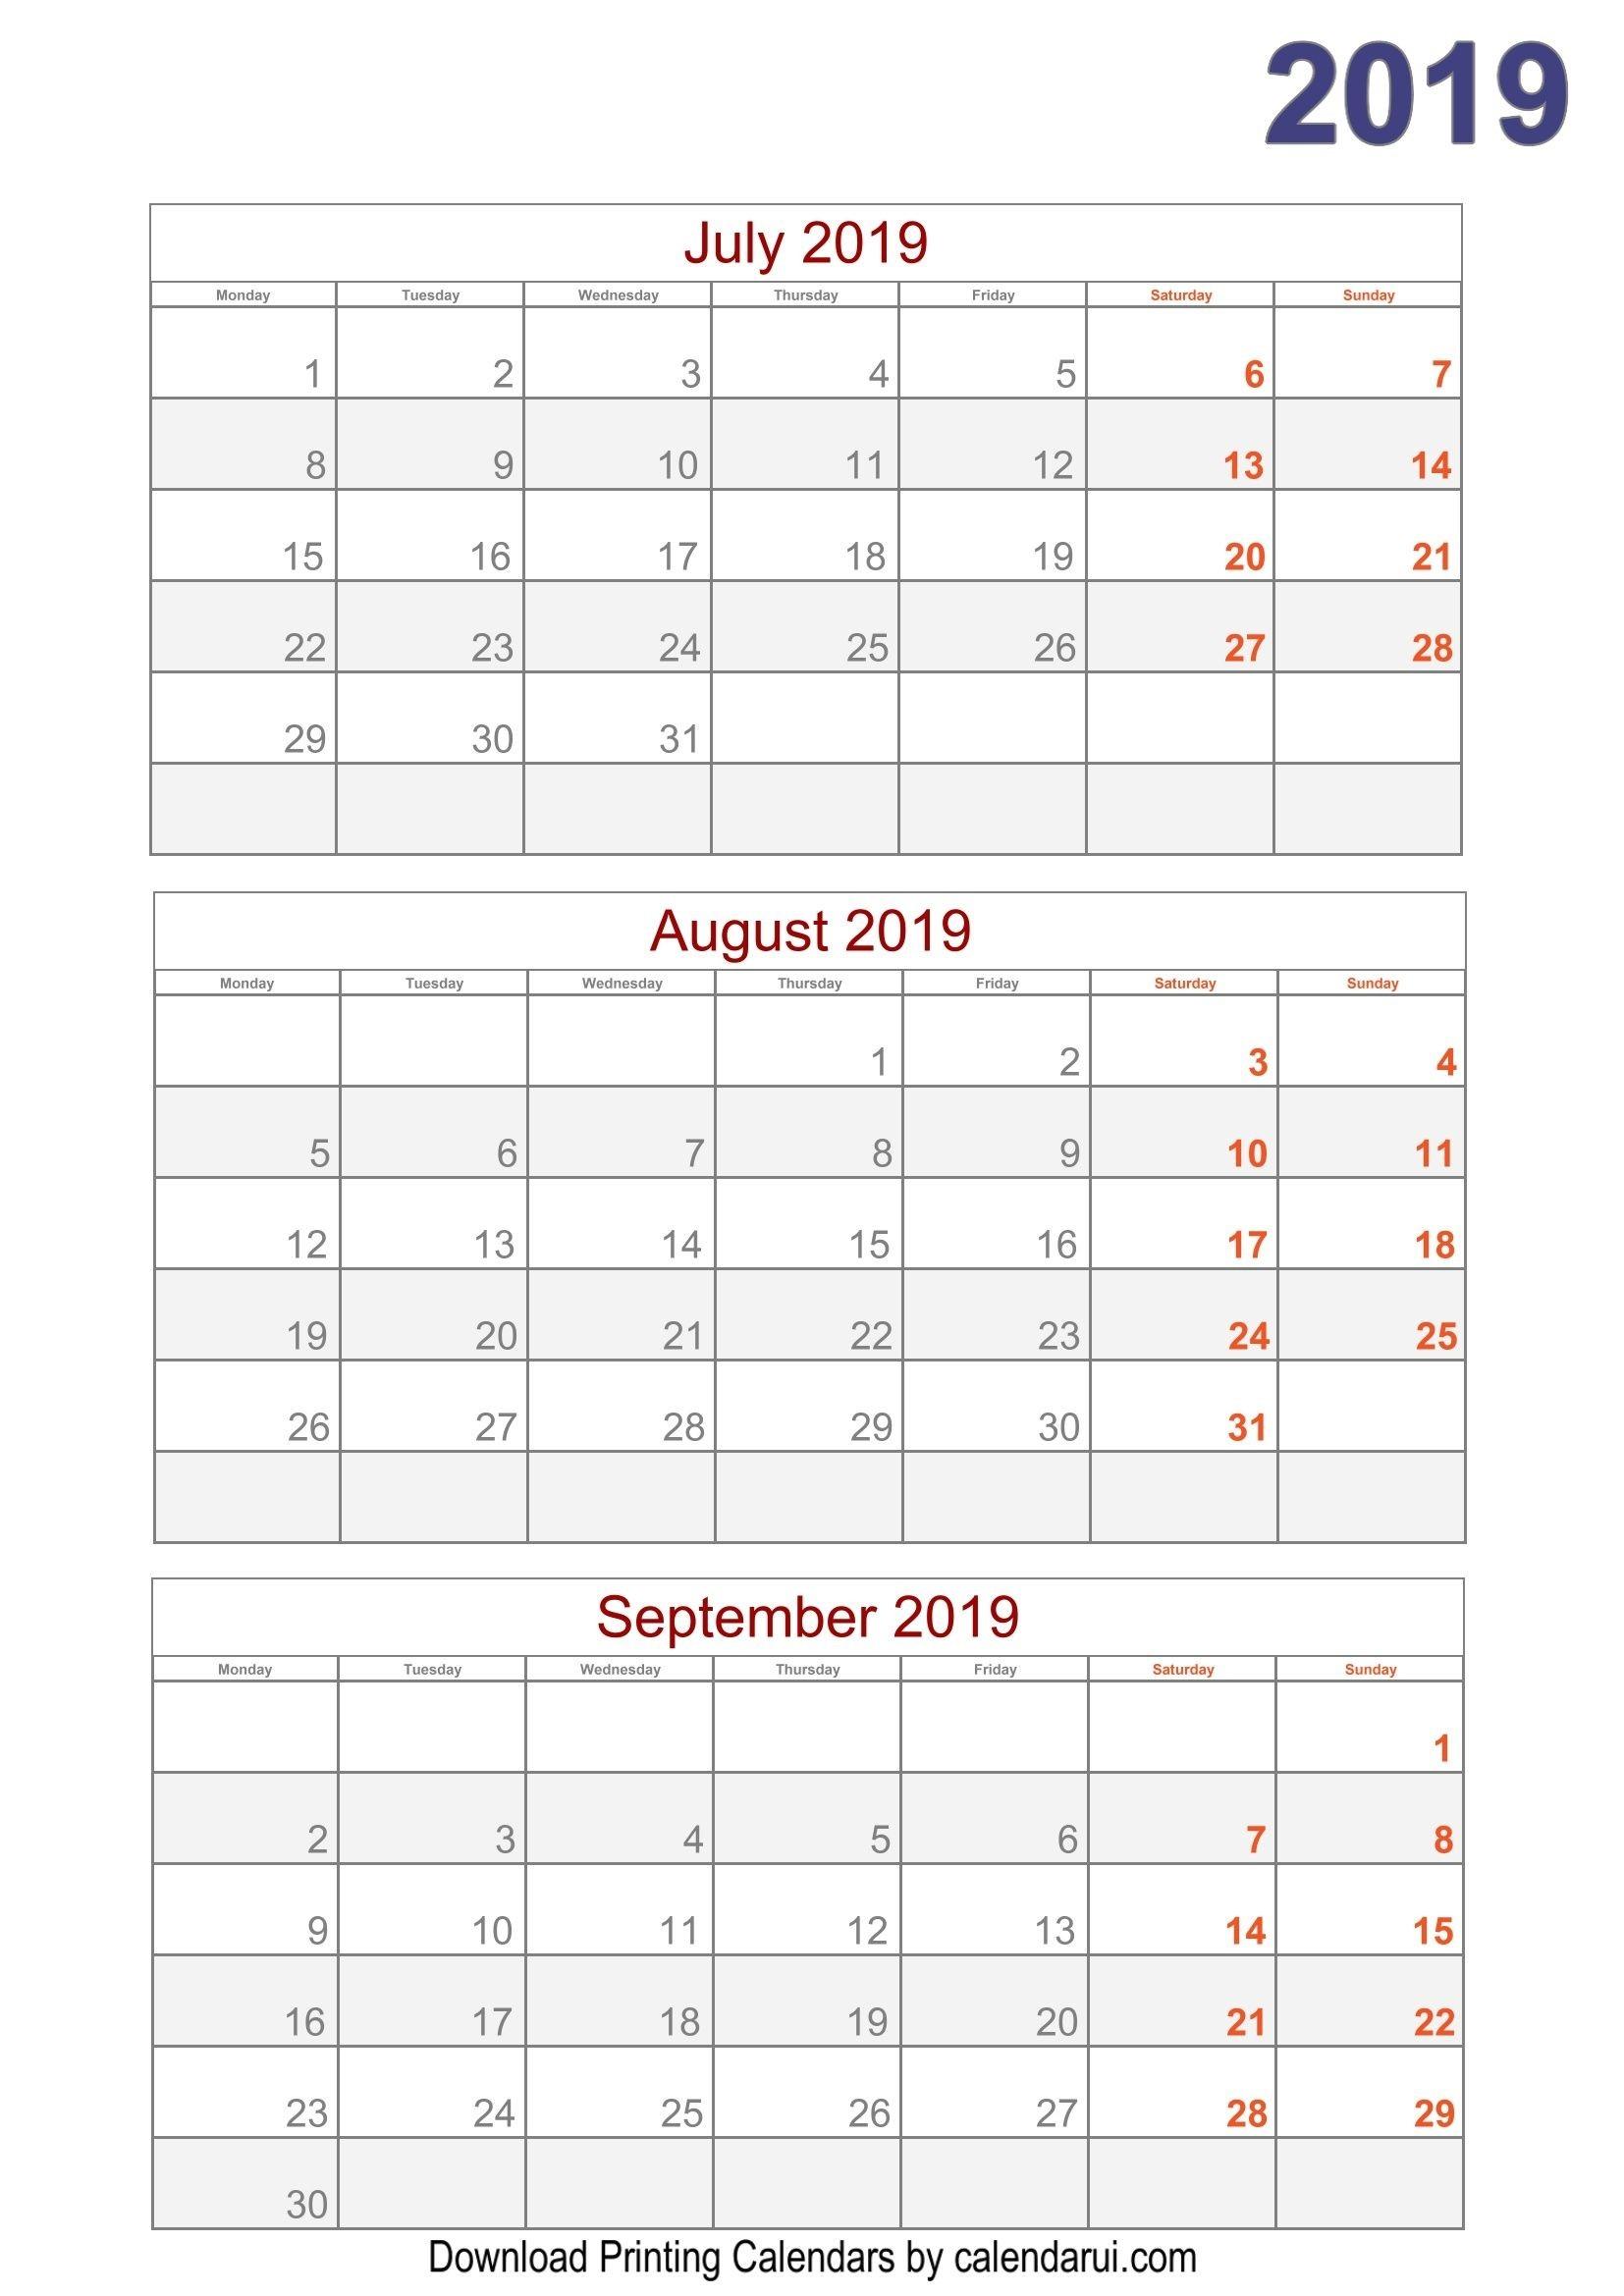 Download 2019 Quarterly Calendar Printable For Free-Blank Quarterly Calendar Printable 2020